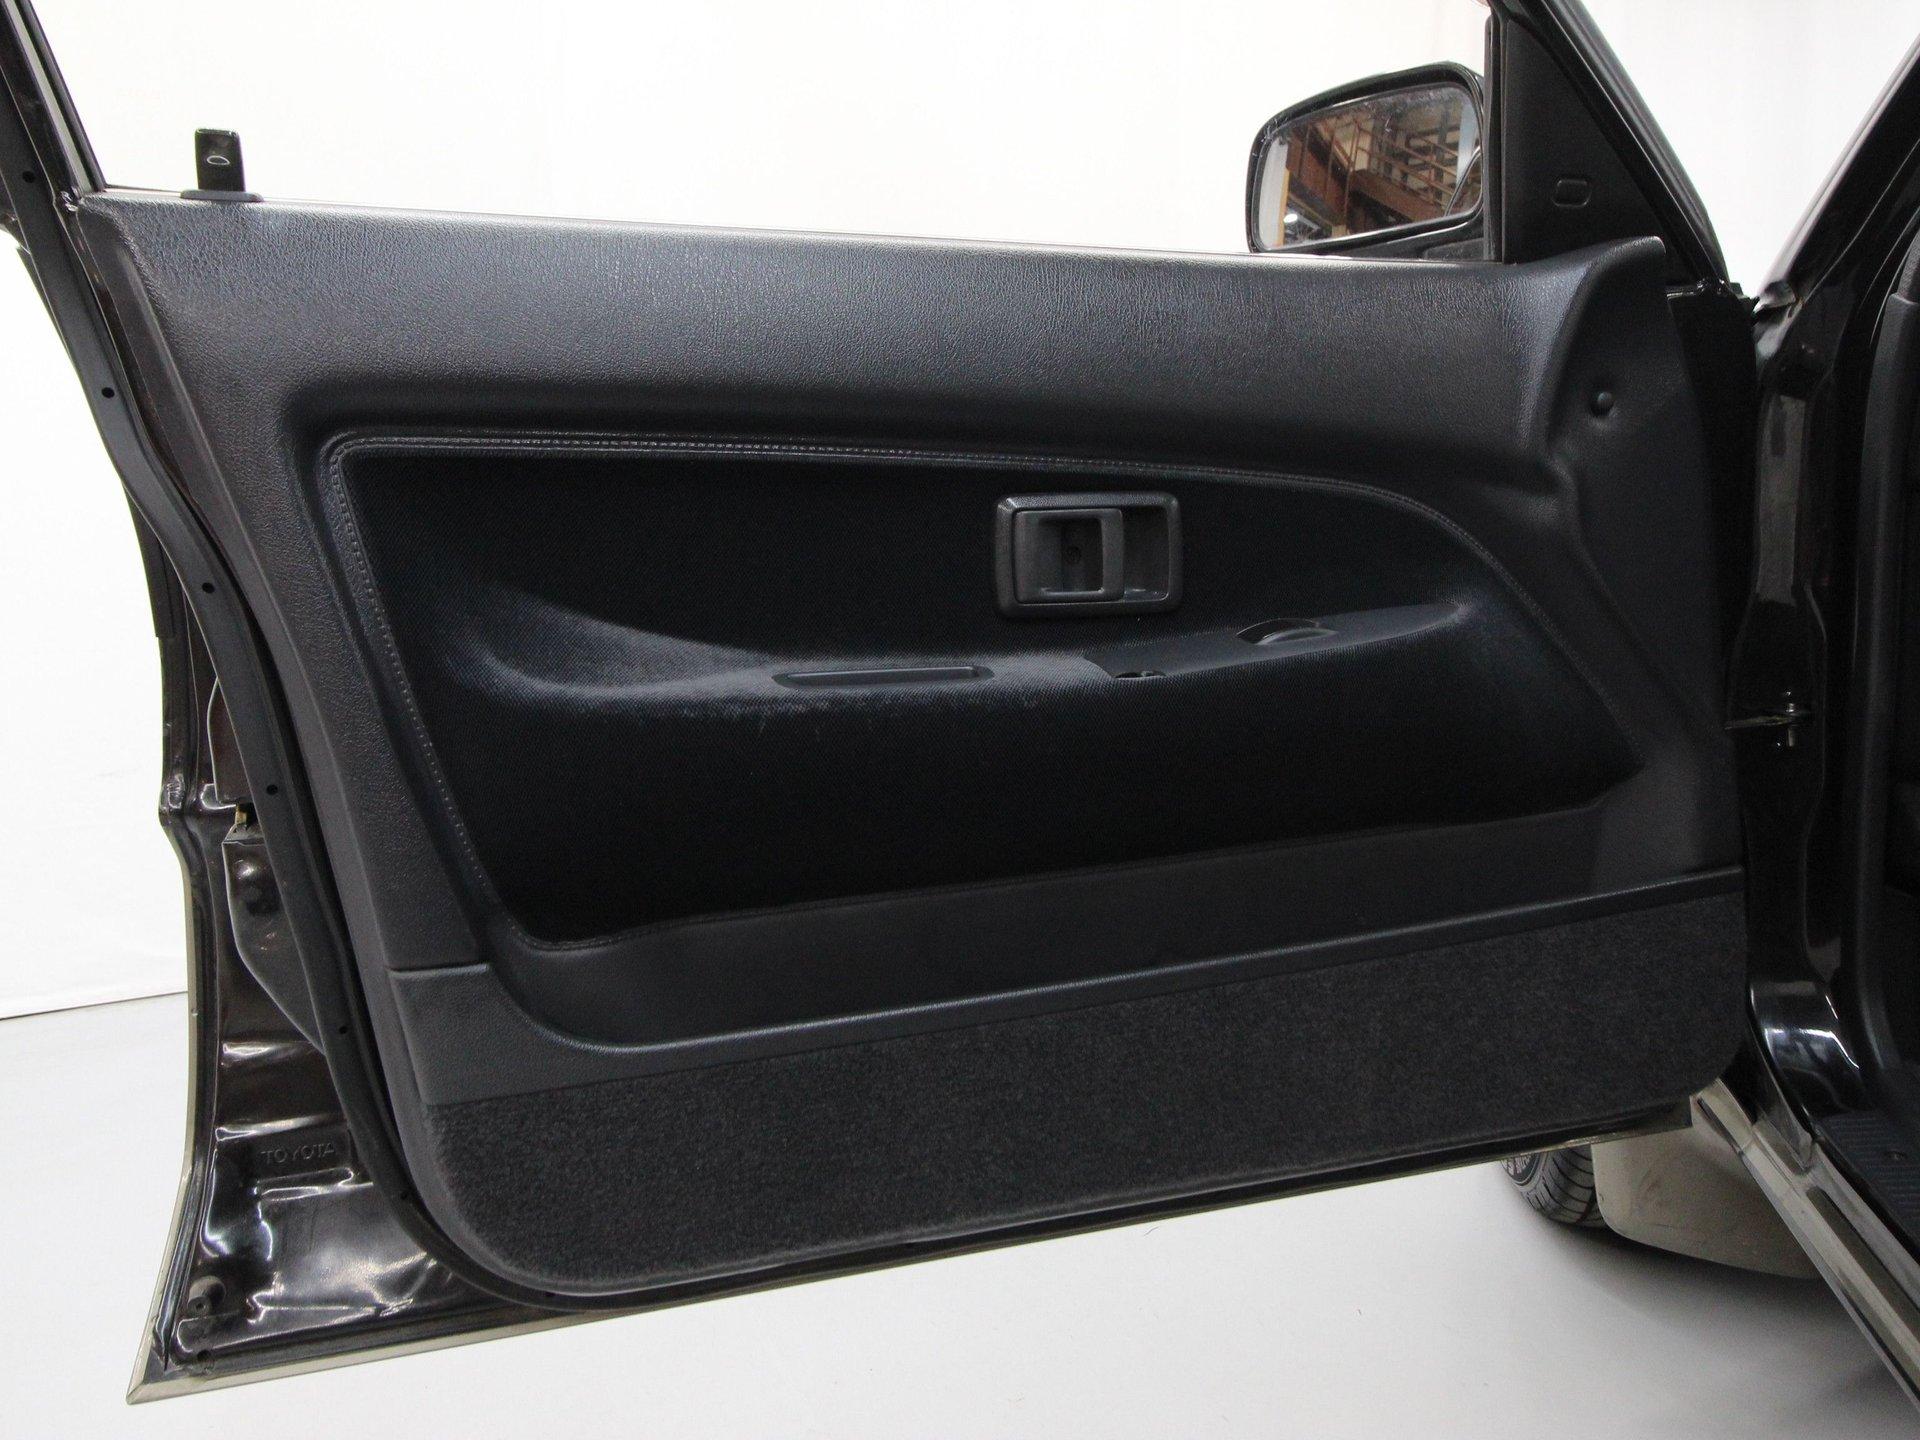 1991 Toyota Sprinter